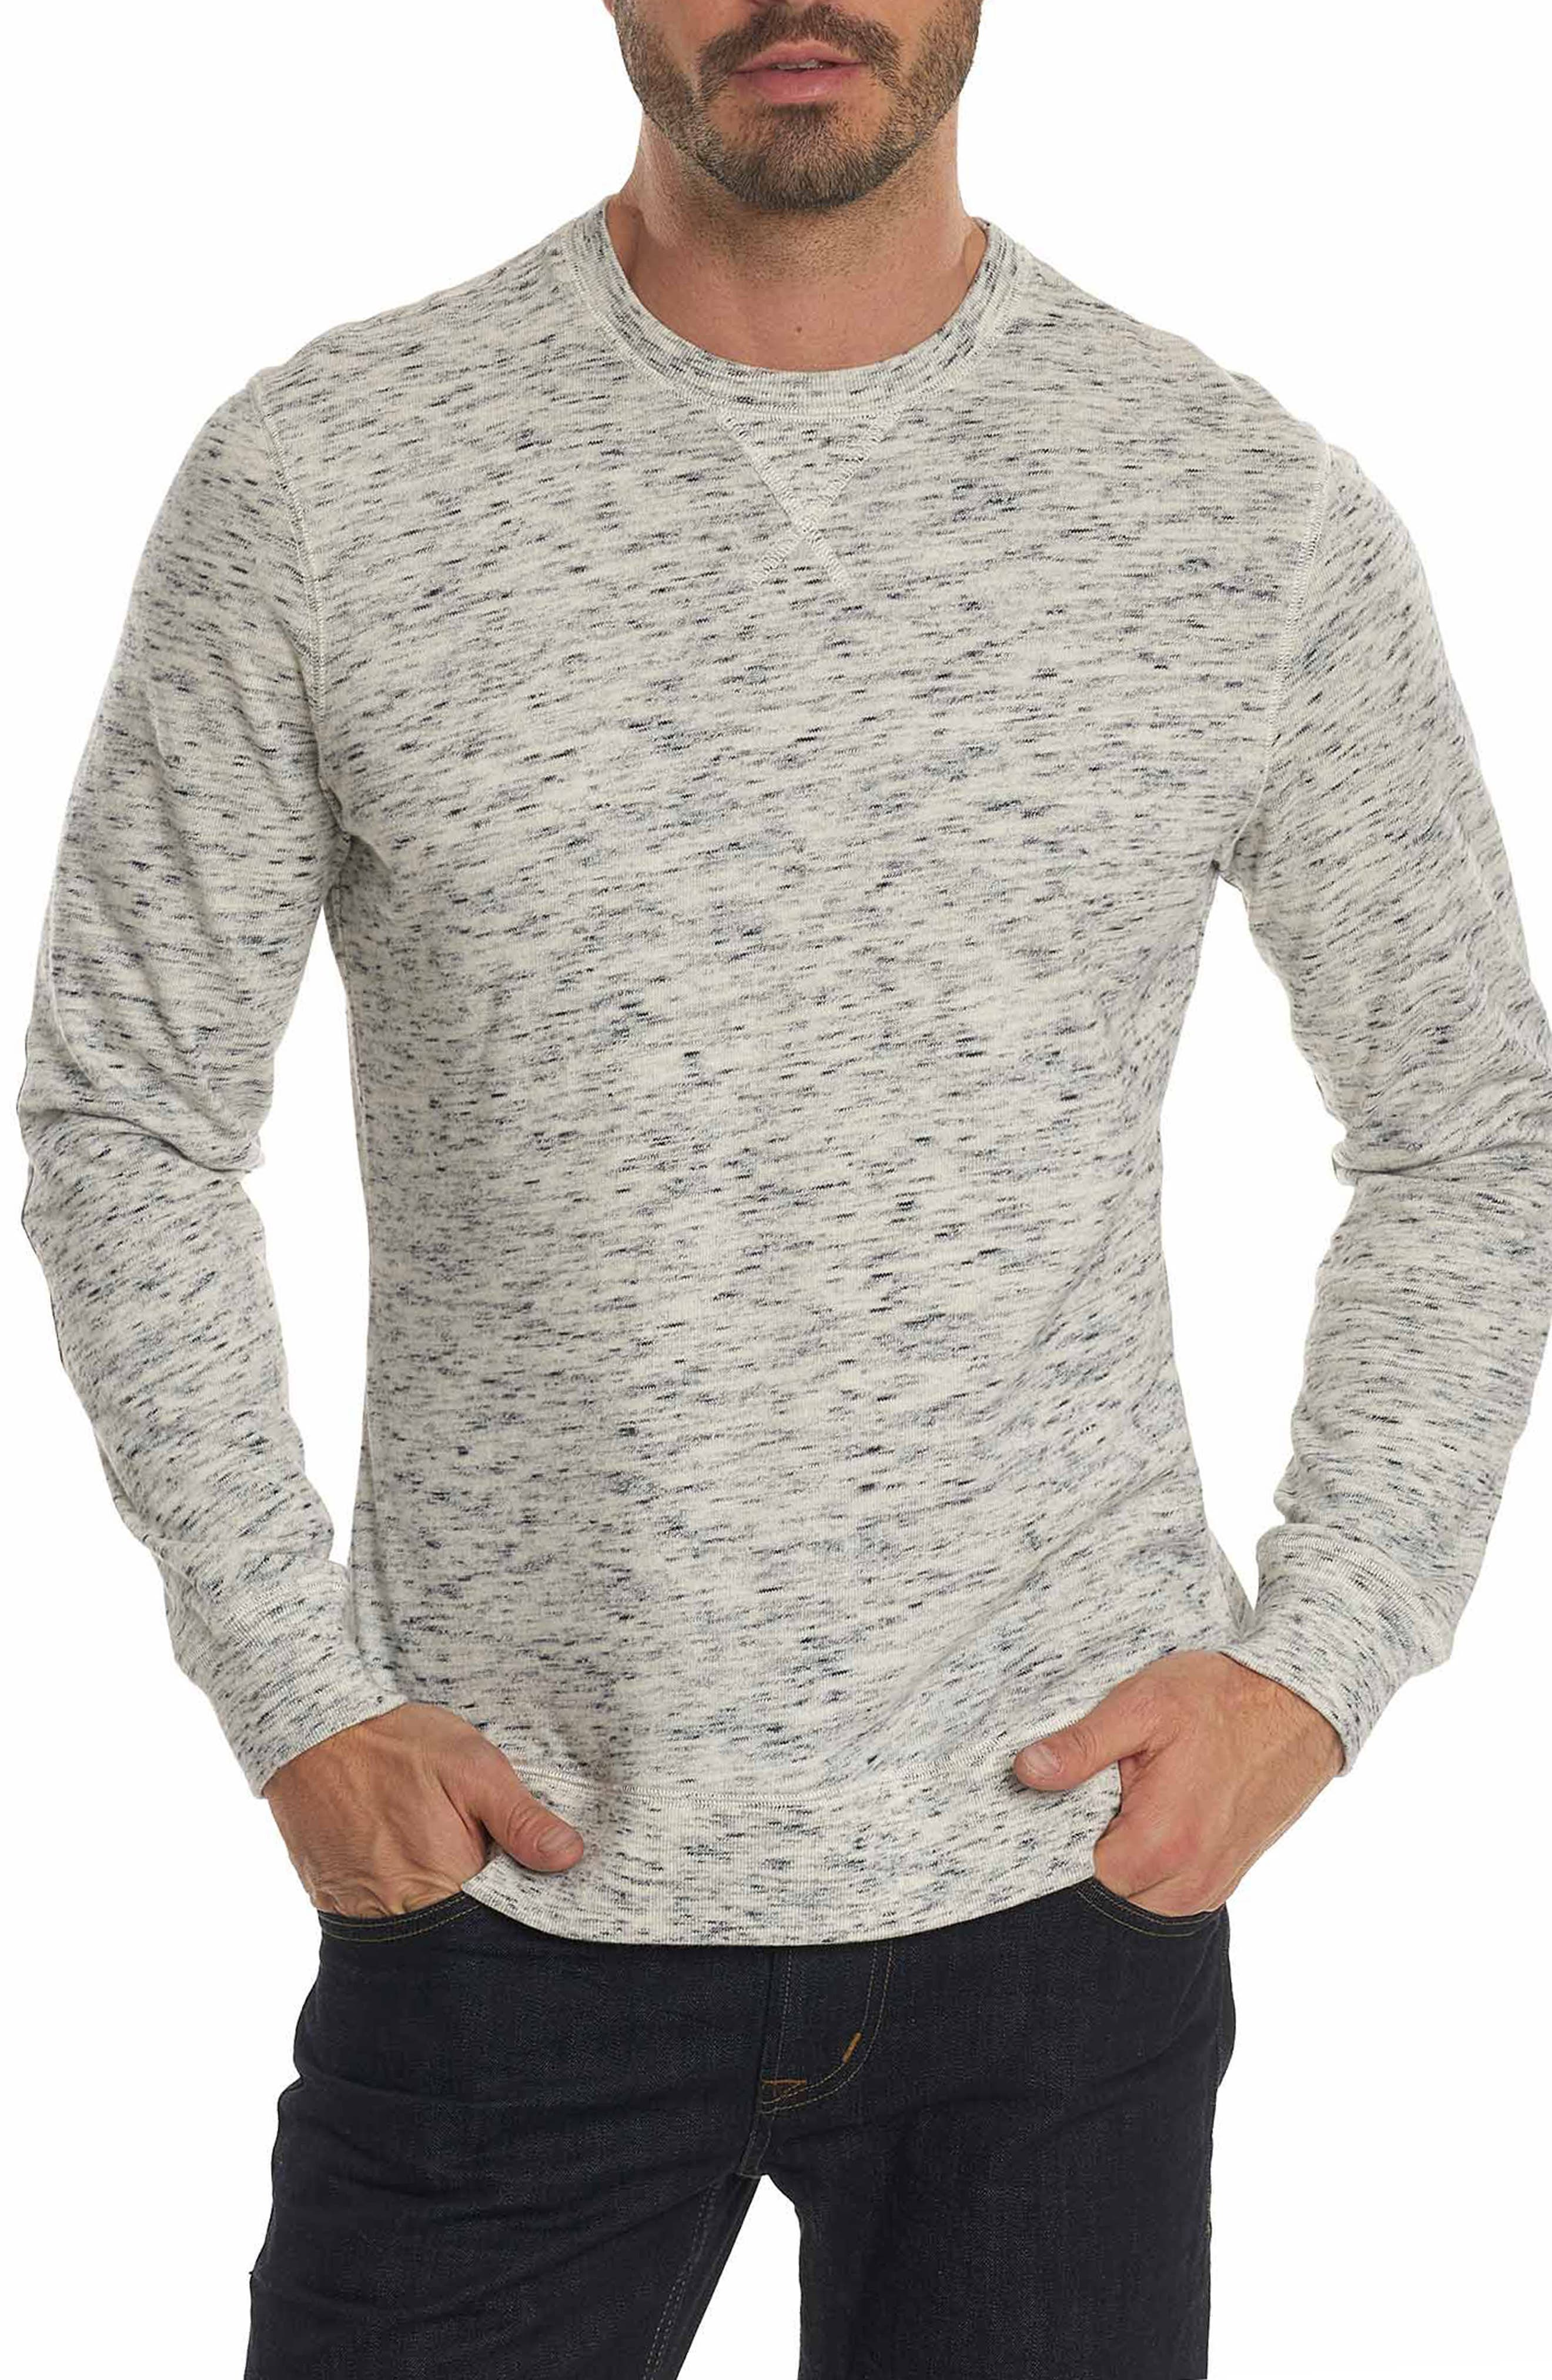 Robert Graham Endurance Elbow Patch Sweatshirt